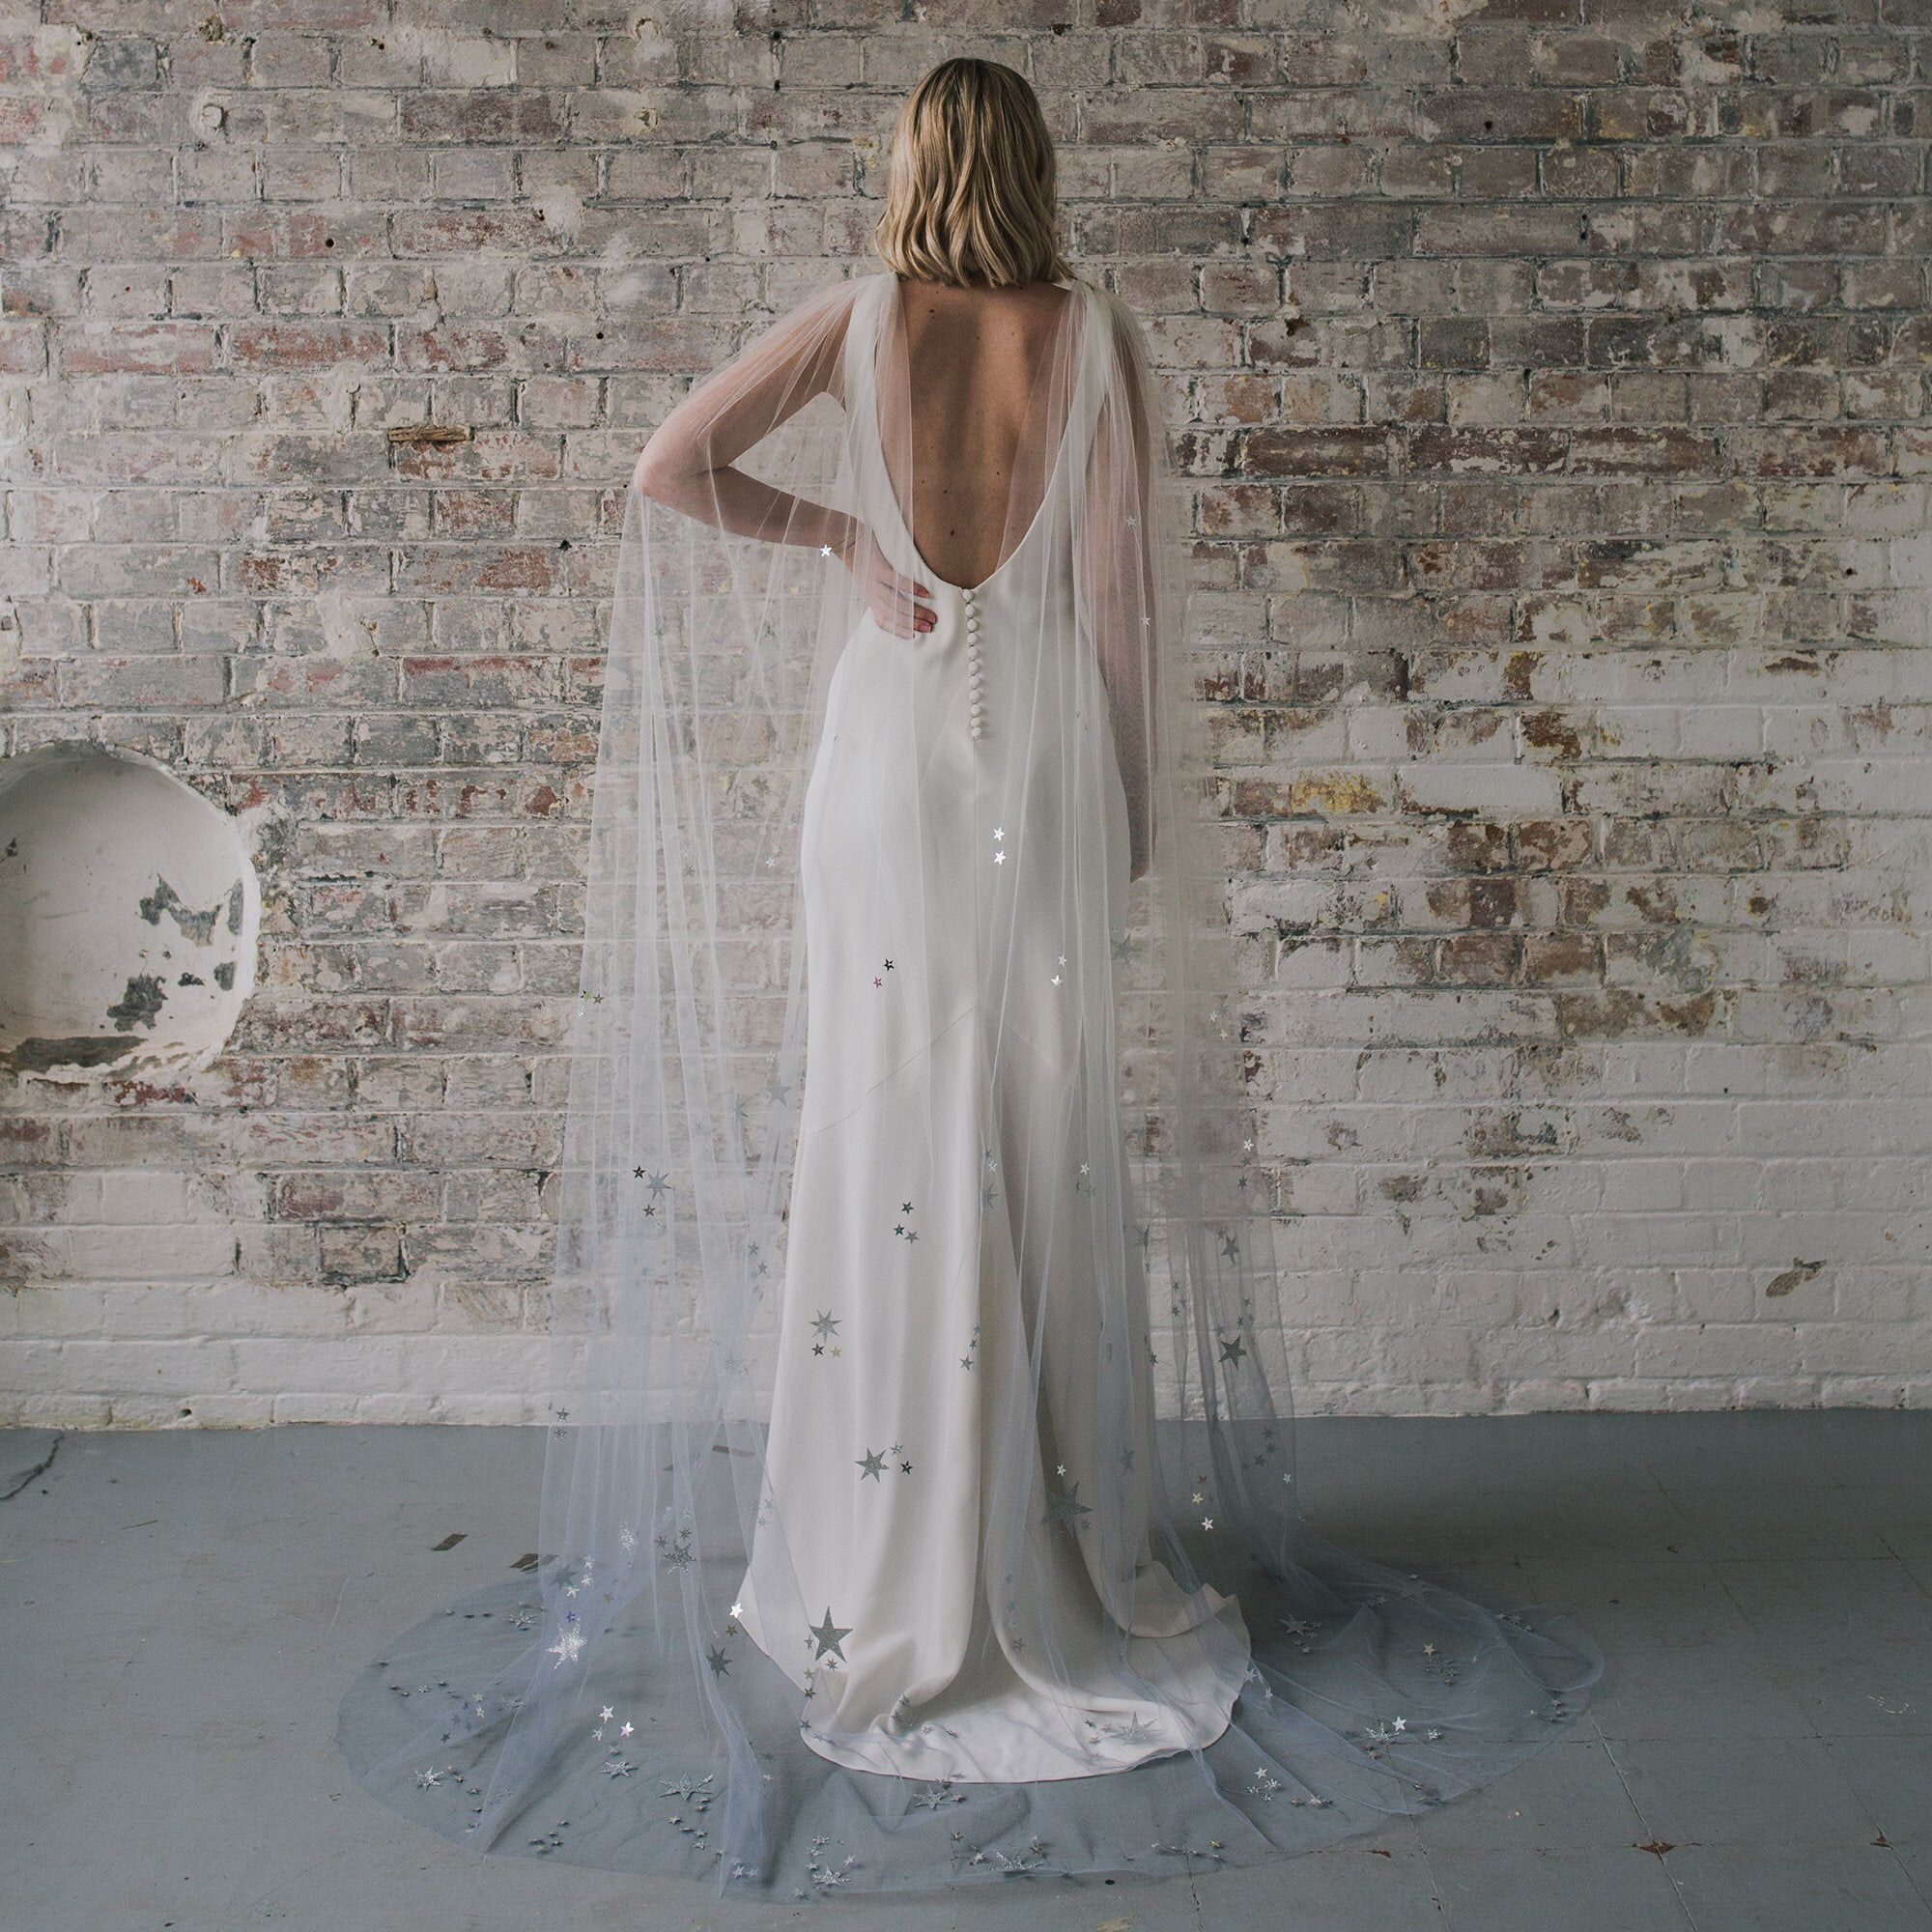 Nebula Star Embellished Ombre Dip Dye Bridal Tulle Cape Etsy Dip Dye Wedding Dress Dye Wedding Dress Bridal Cape